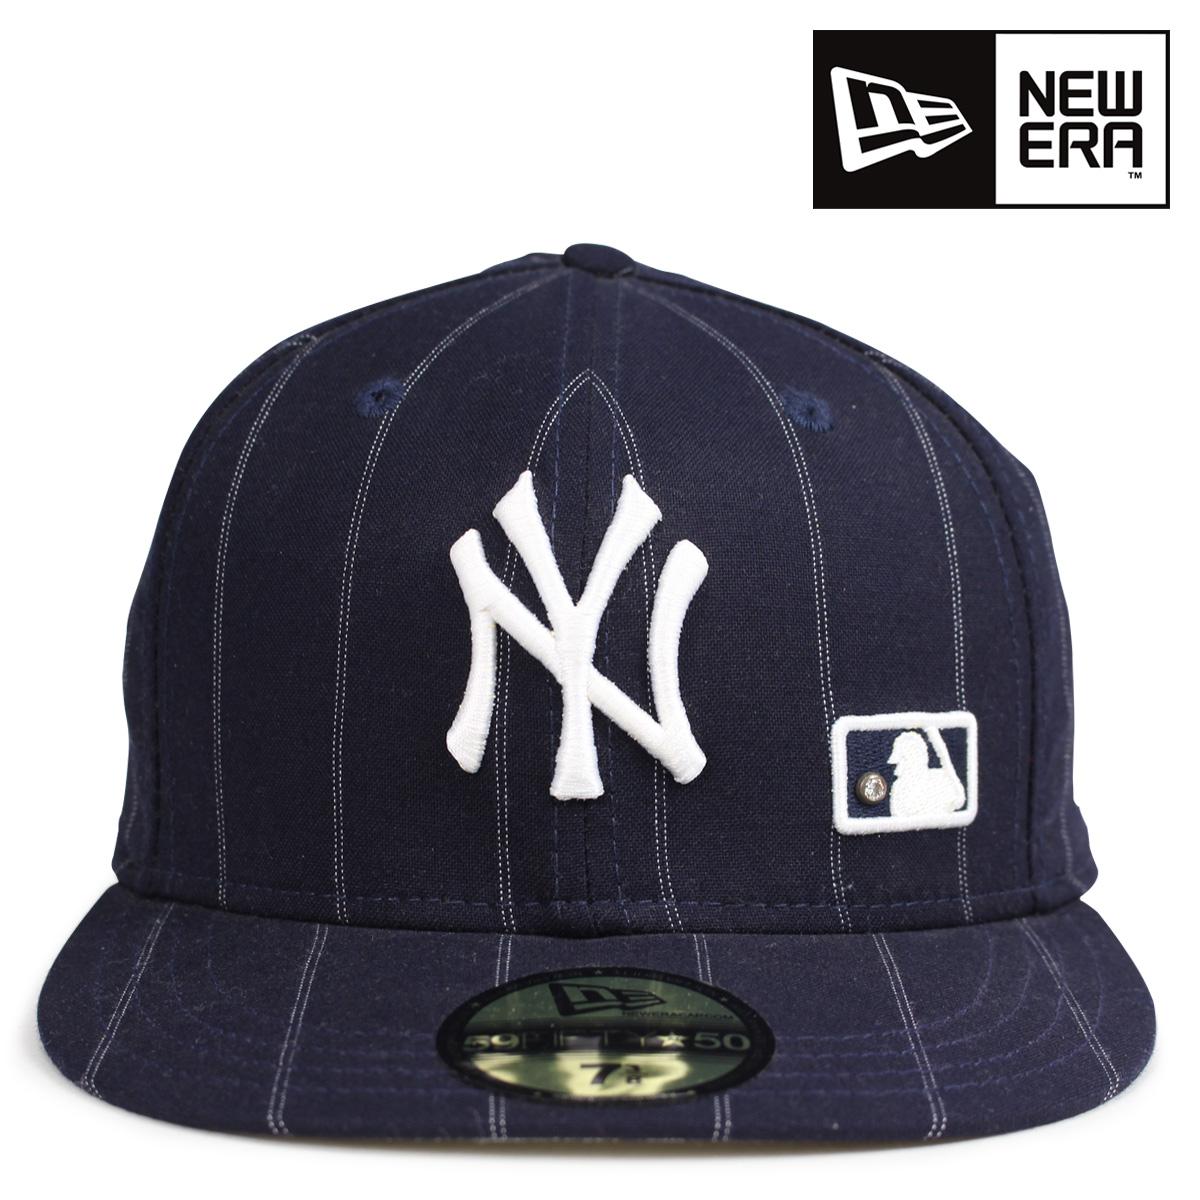 Sugar Online Shop  NEW ERA new gills cap 59FIFTY New York Yankees ... 92c4bdfa0f3